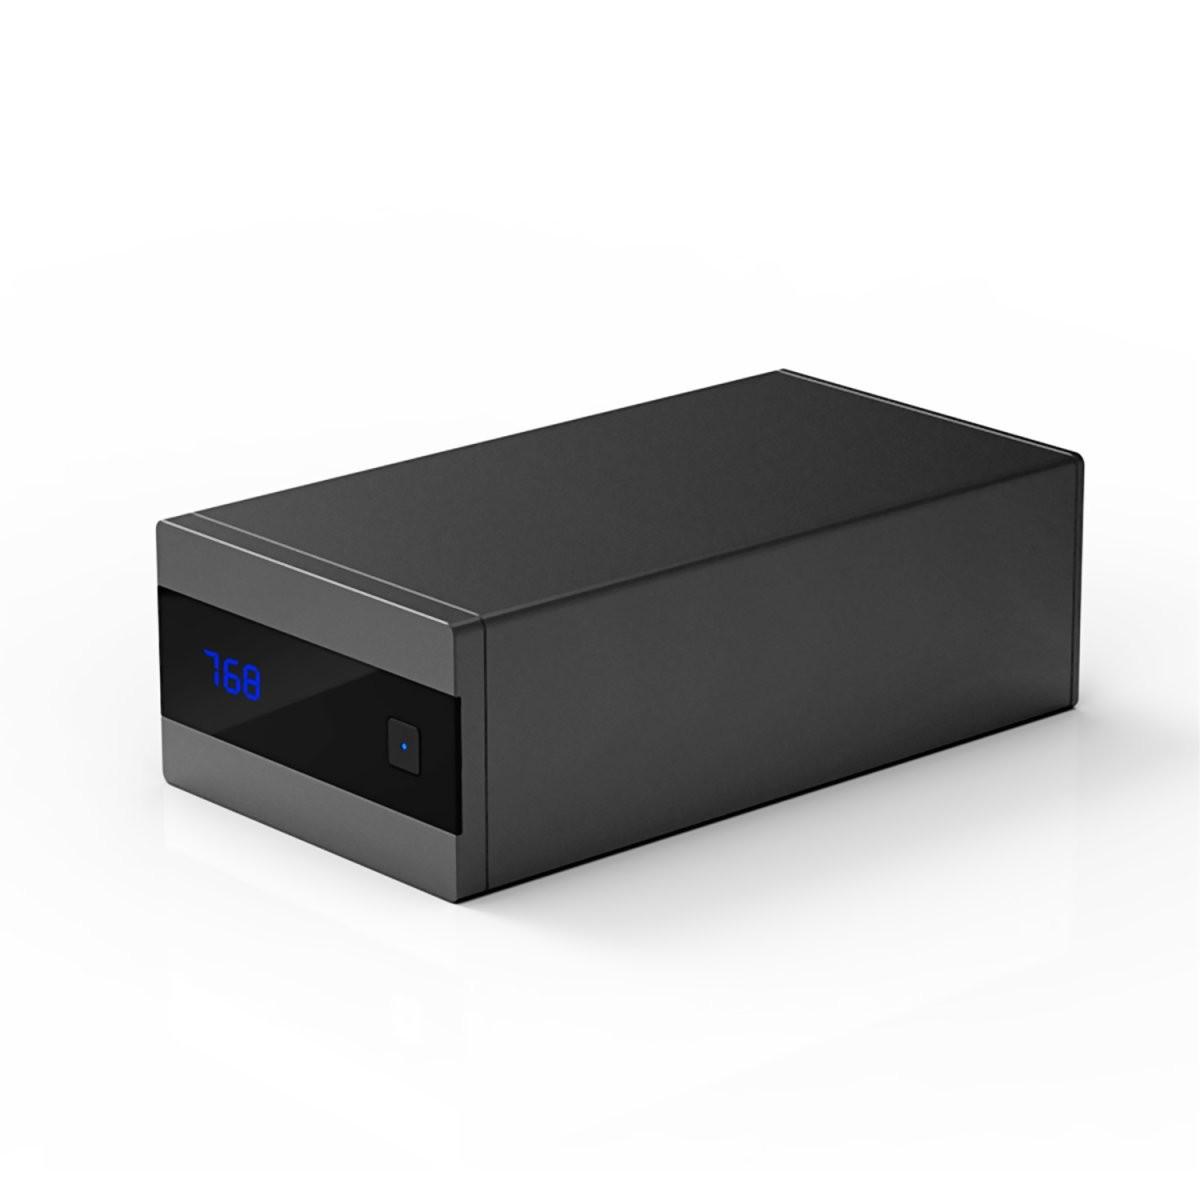 SMSL SANSKRIT 10Th MKII DAC 32bit / 768kHz DSD512 USB XMOS AK4493 Noir